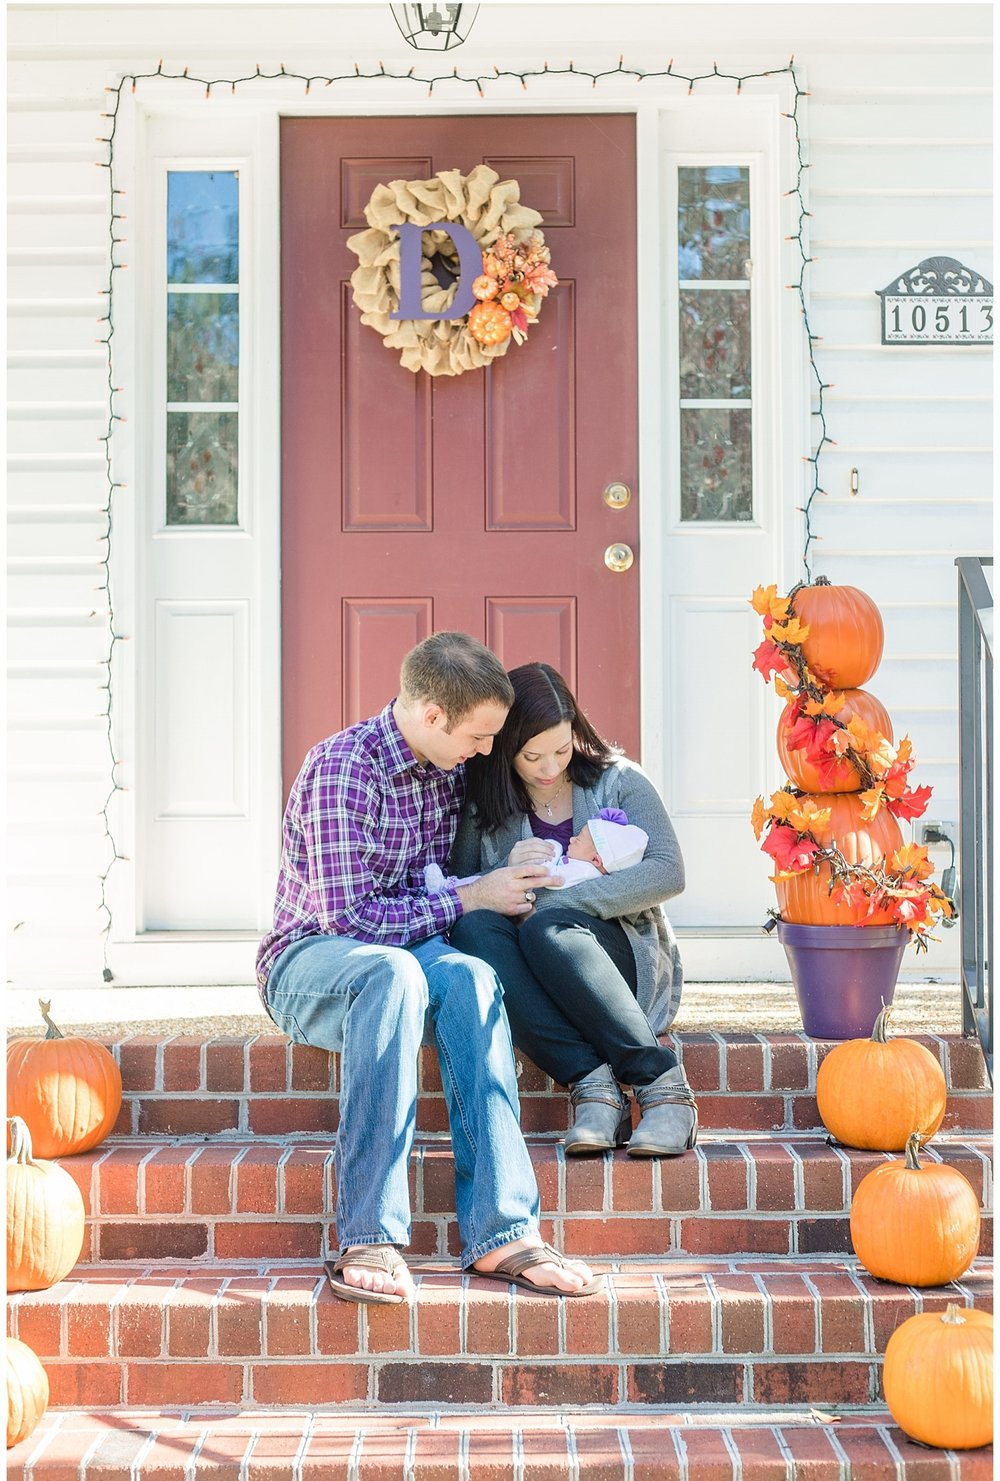 Richmond Fine Art Family Photography - Newborn Baby in Pumpkin